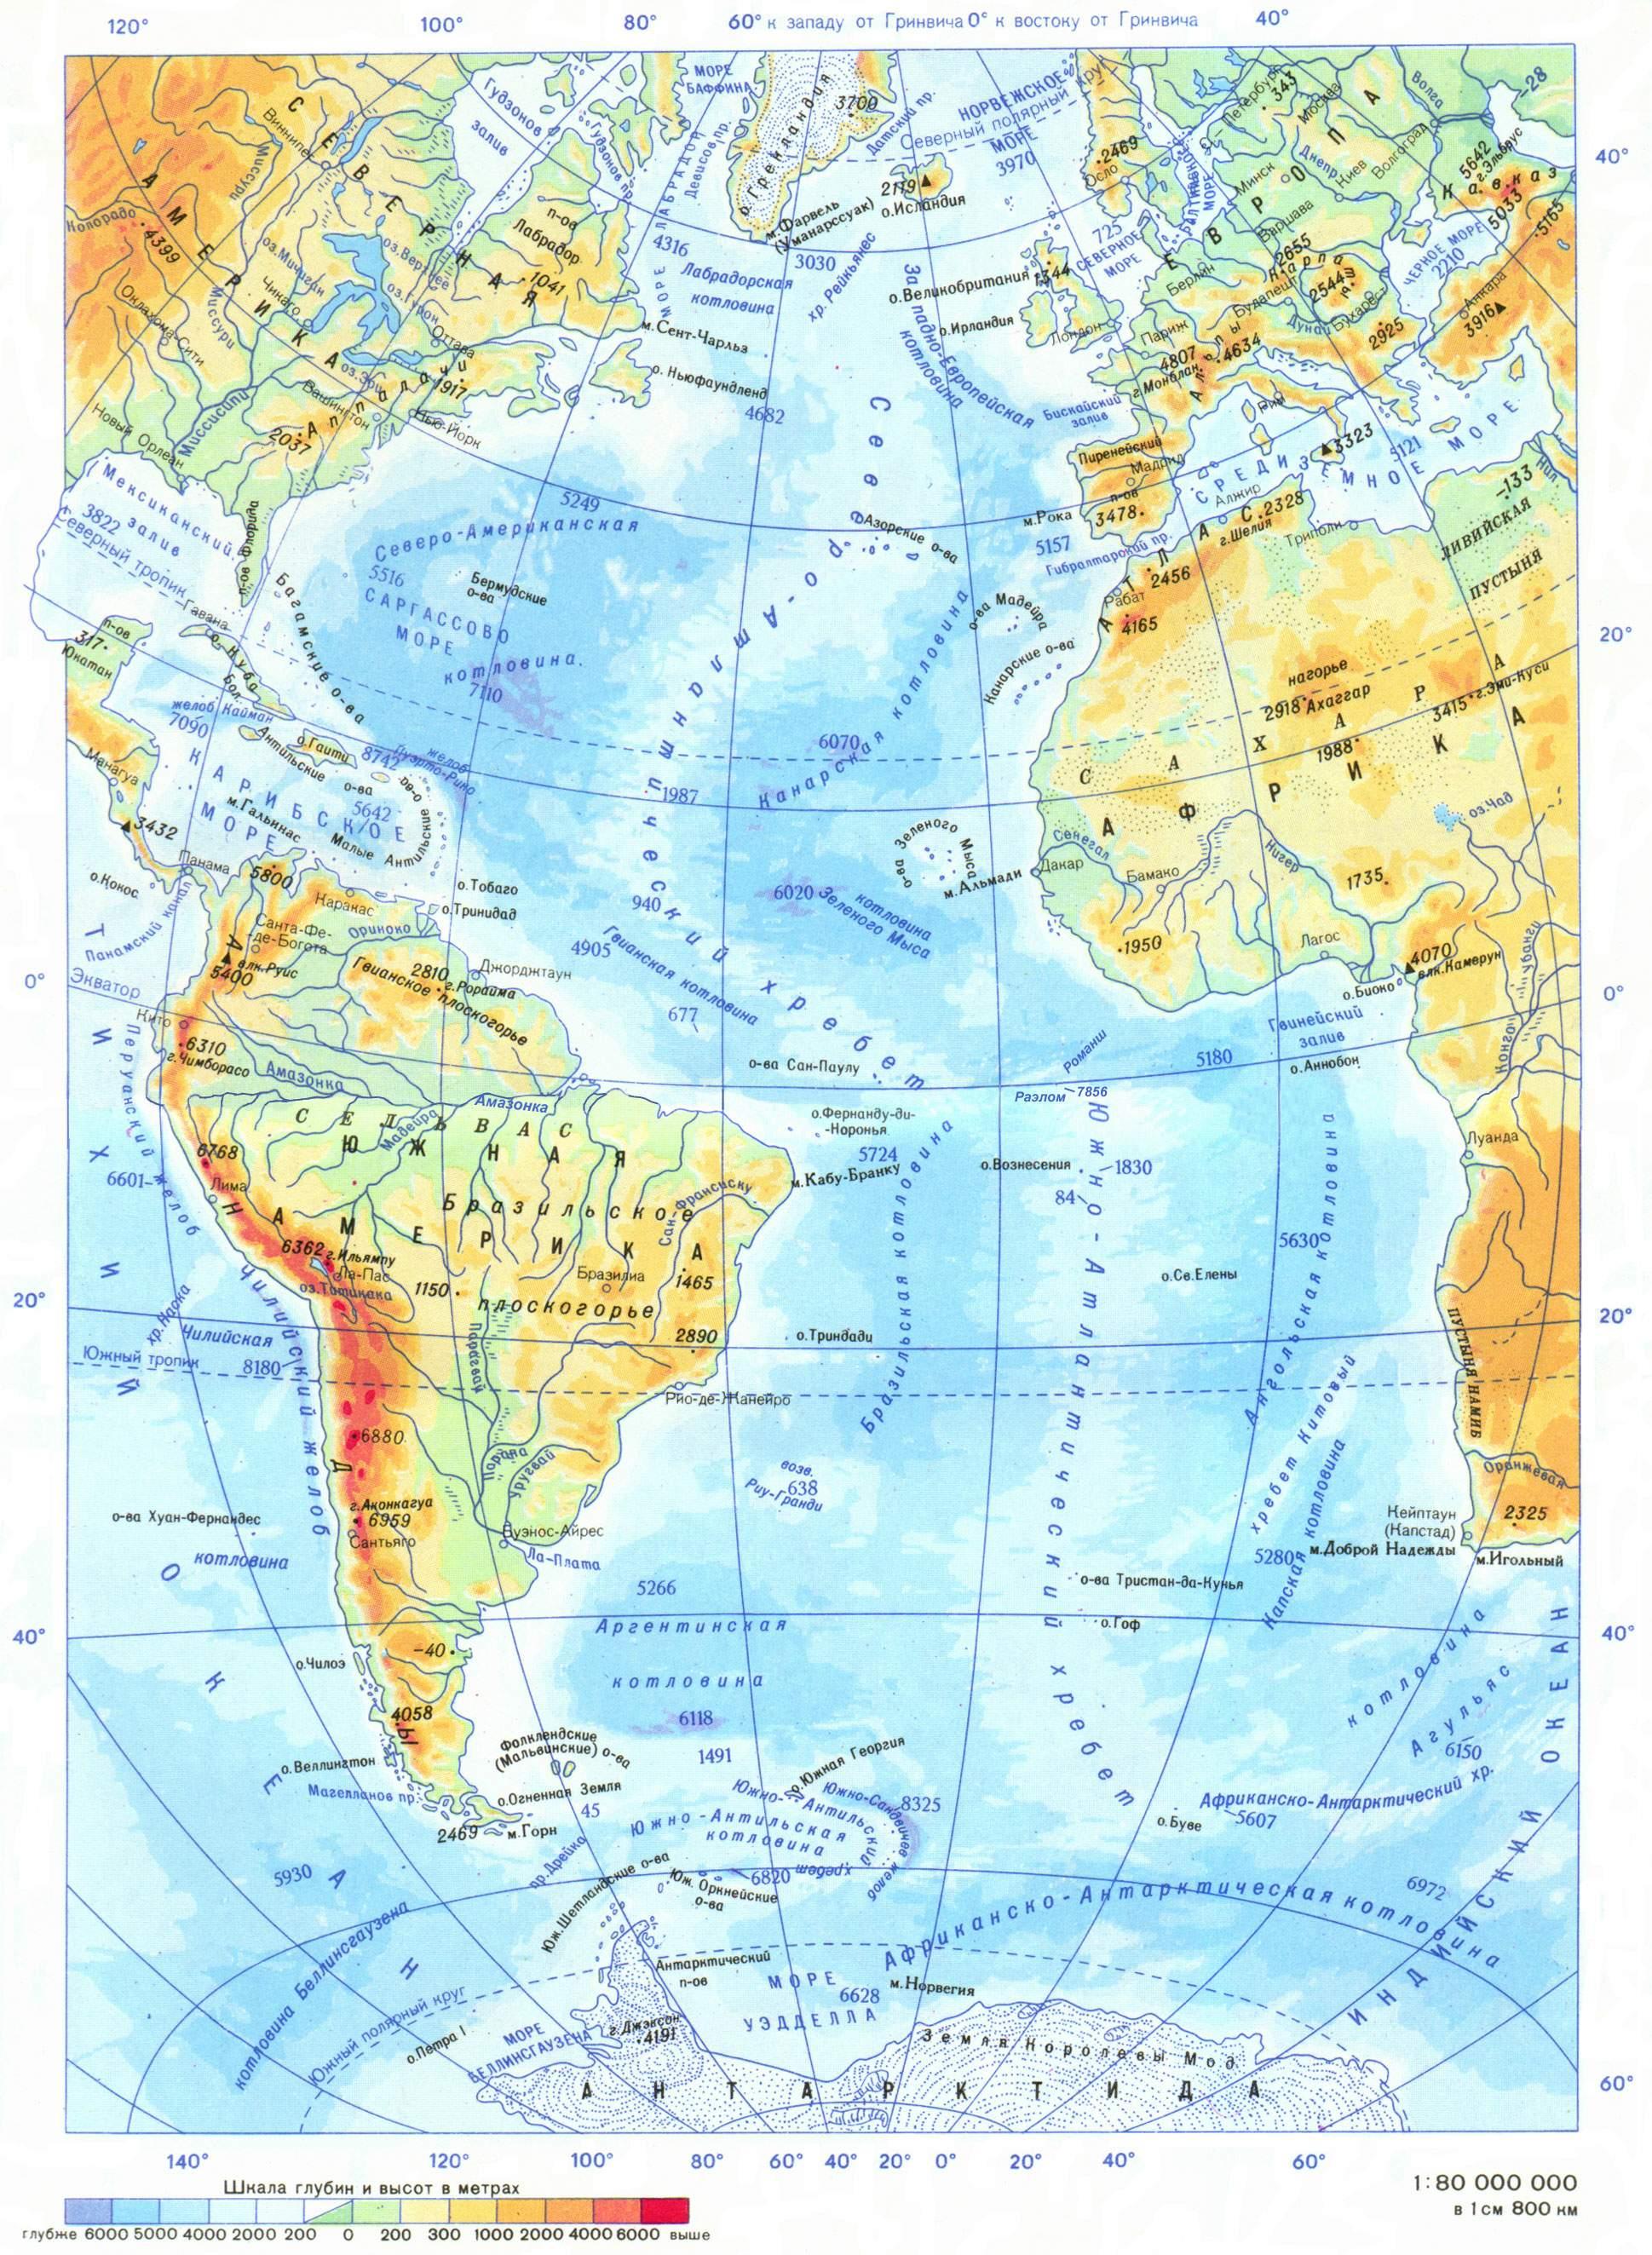 где на карте находится атлантический океан фото